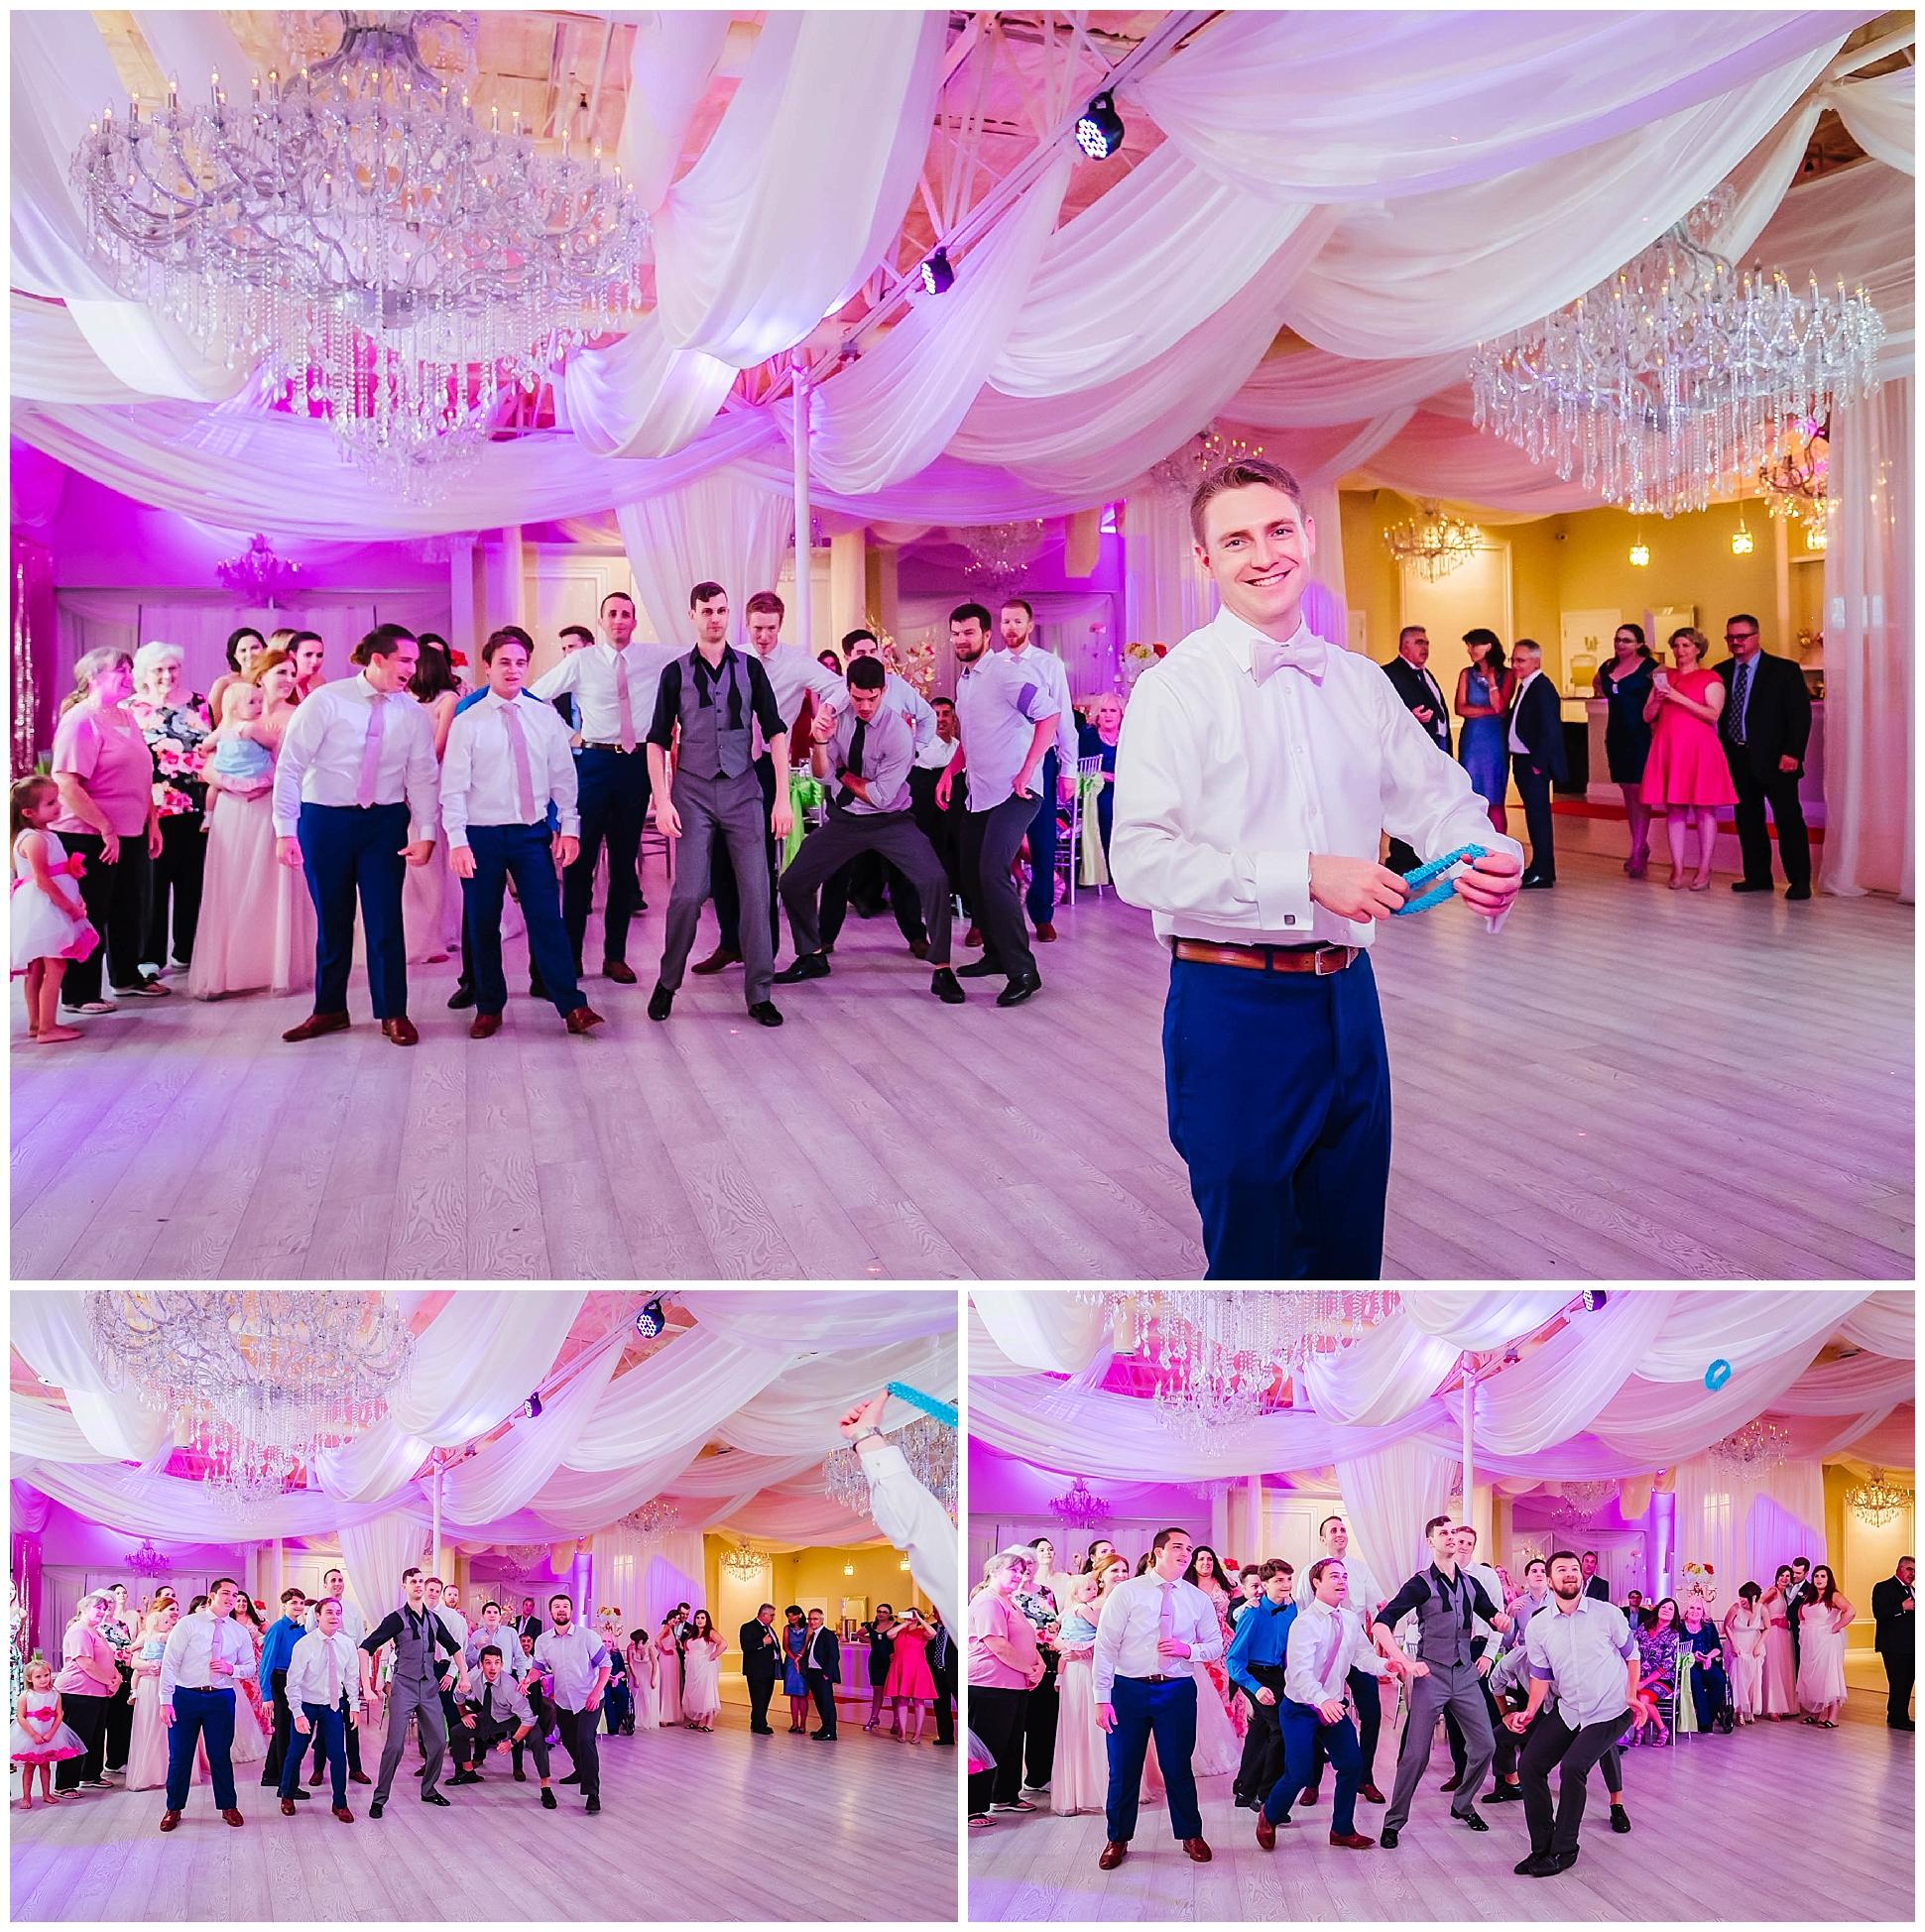 st-pete-wedding-photographer-sunken-gardens-crystal-ballroom-princess-dancer_0205.jpg